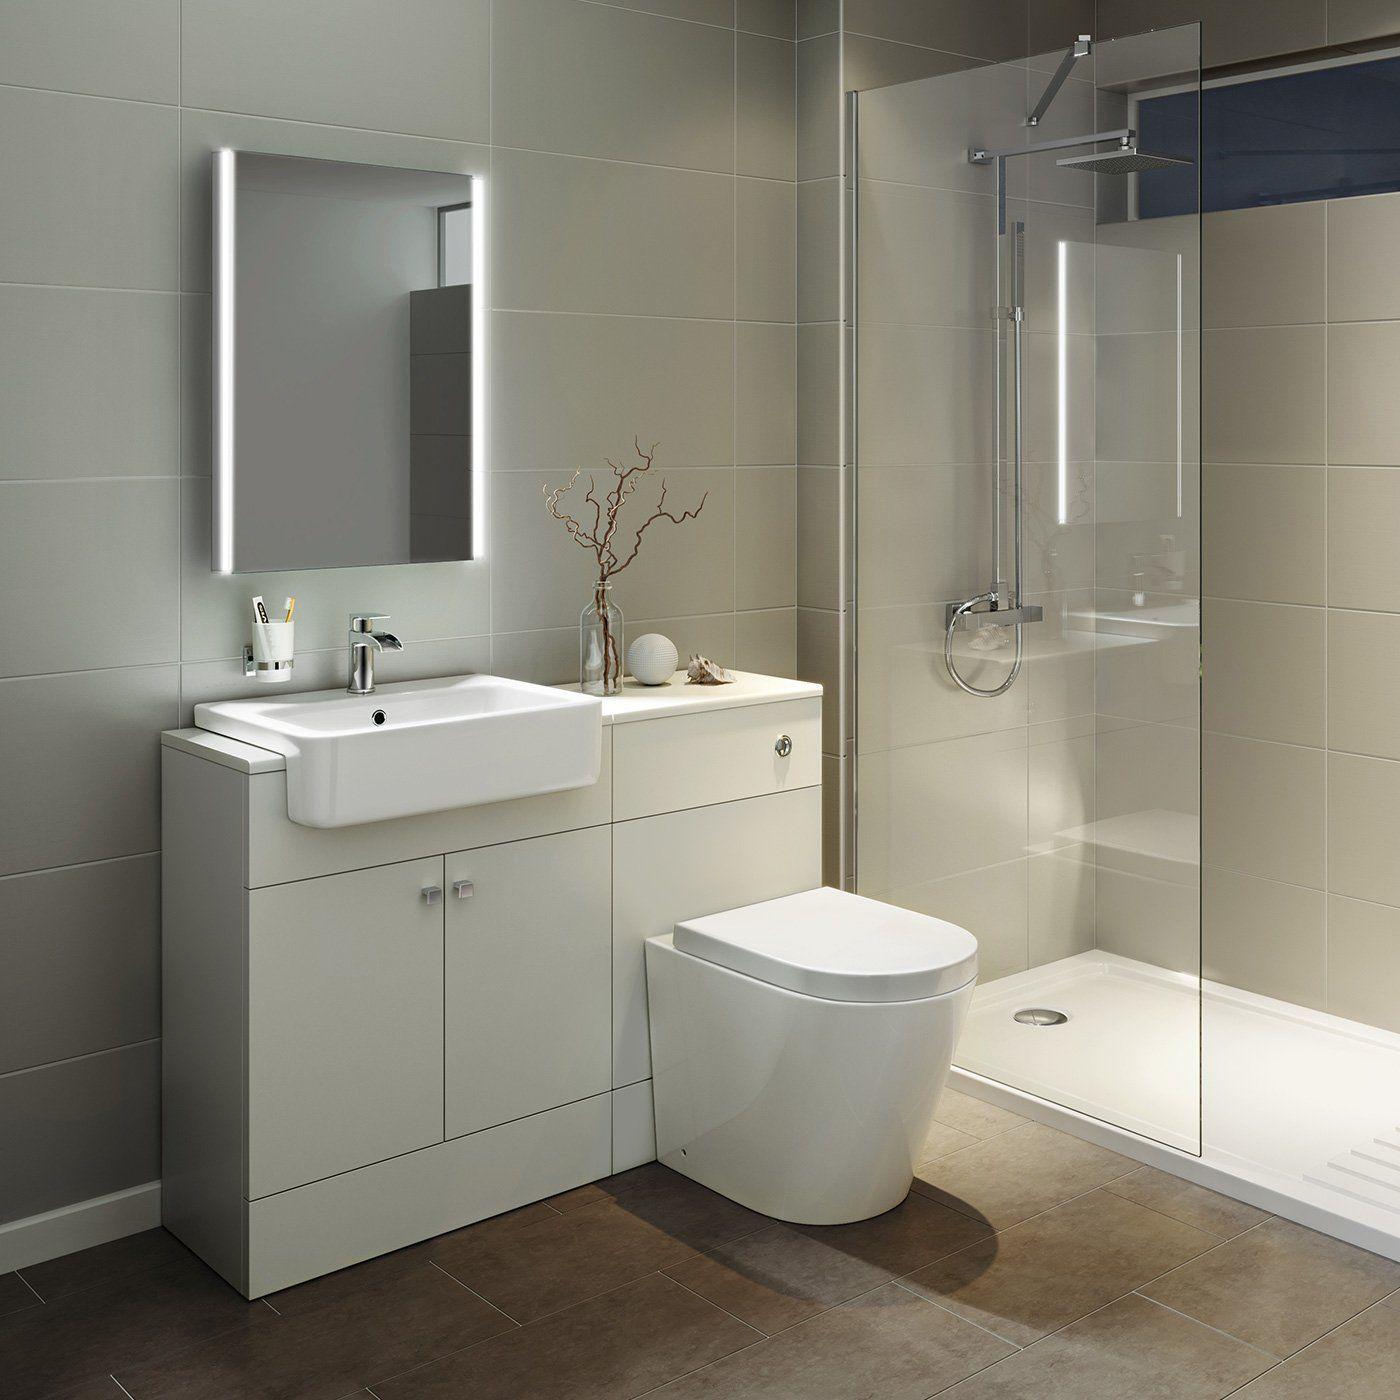 500 X 700 Mm Modern Illuminated Battery Led Light Bathroom Mirror Mc158 Bathroom Mirror Lights Led Mirror Bathroom Bathroom Mirror